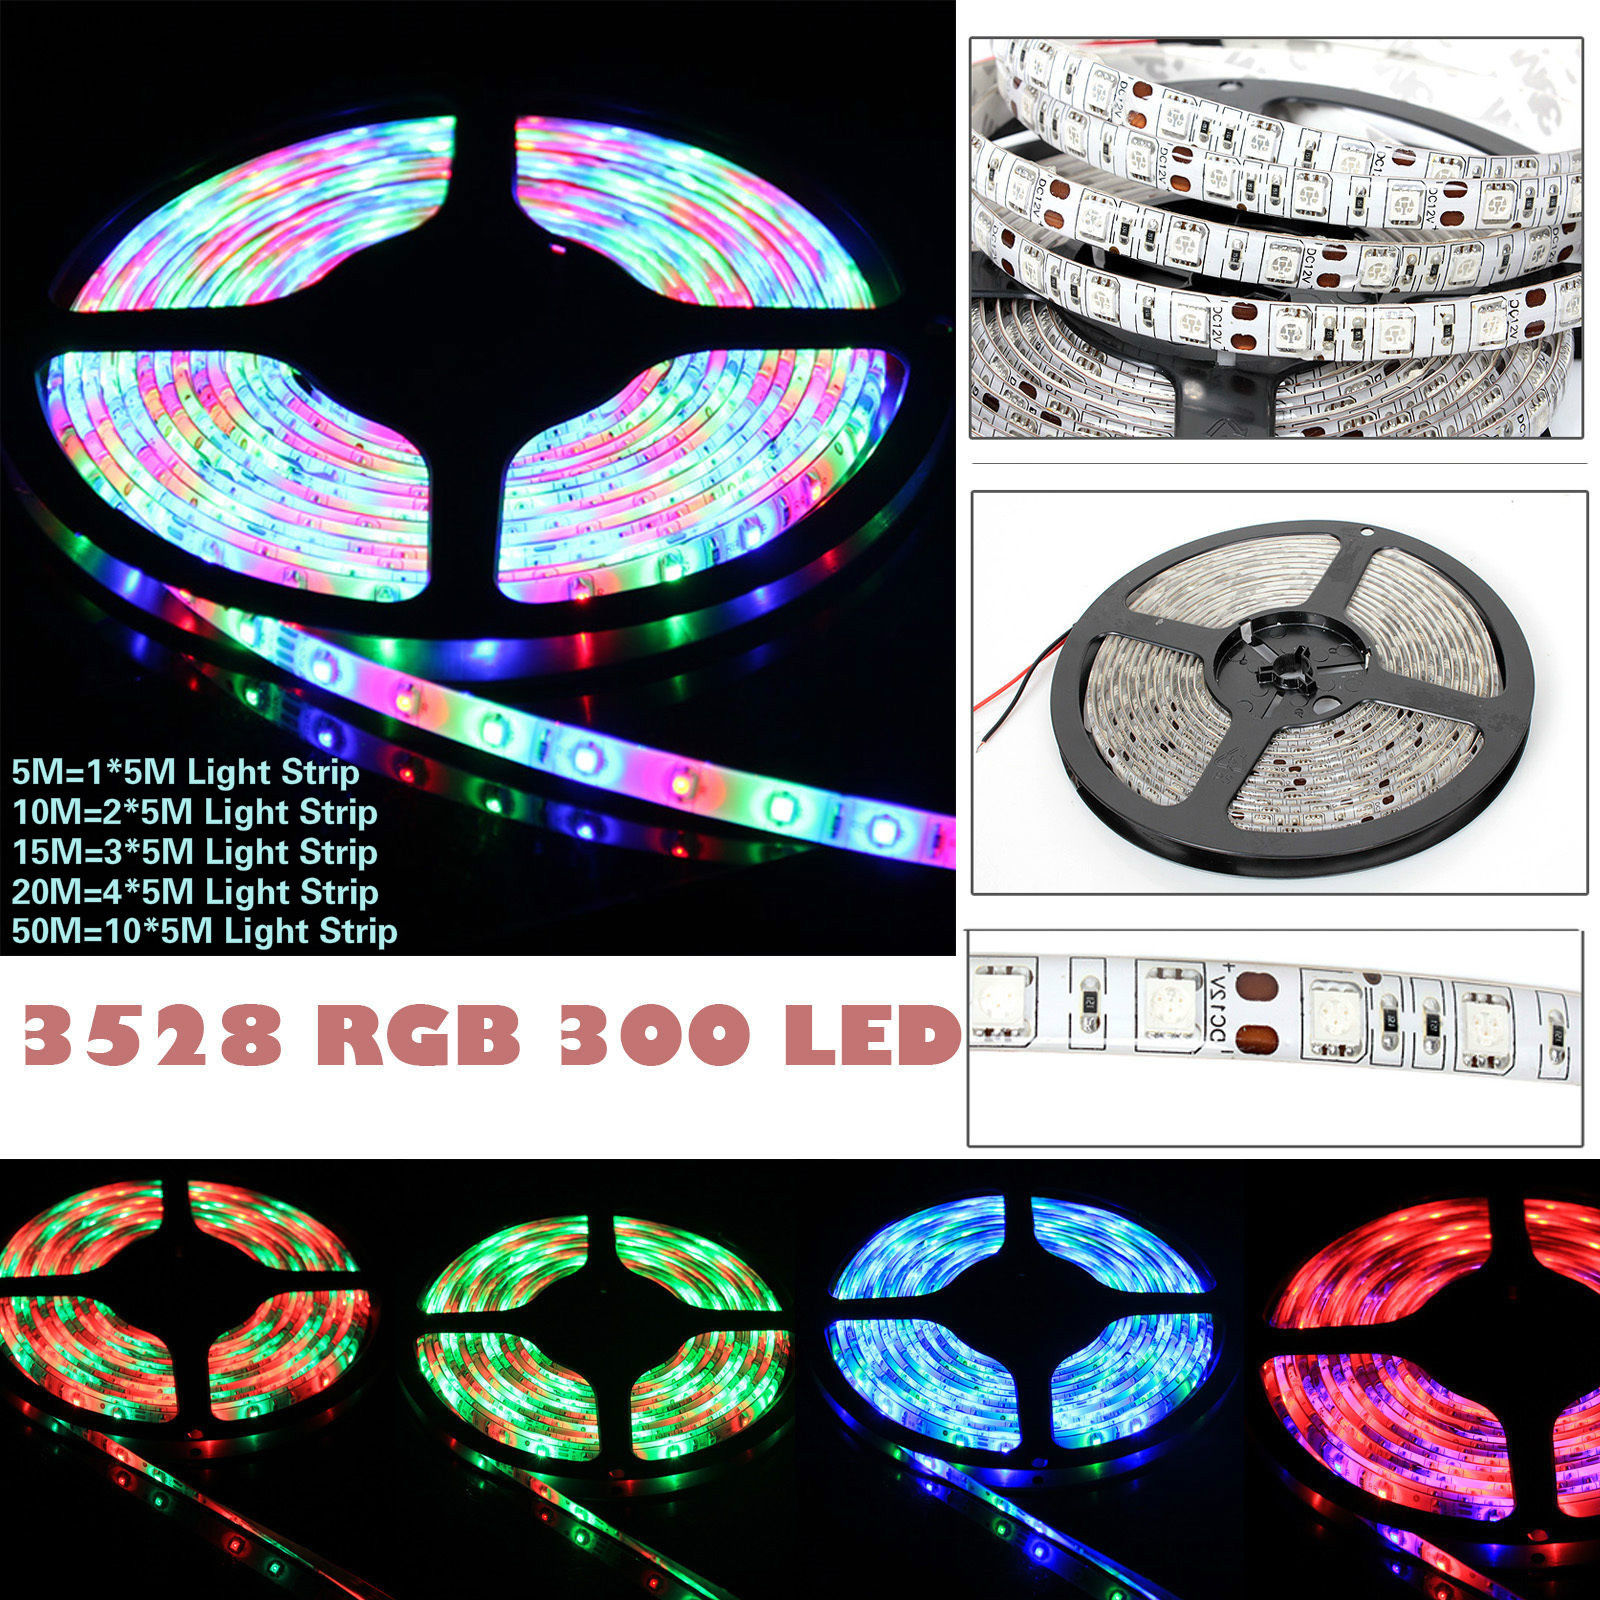 3528 rgb 5m 10m 15m 20m 50m led strip light tape 24key remote power supply ebay. Black Bedroom Furniture Sets. Home Design Ideas